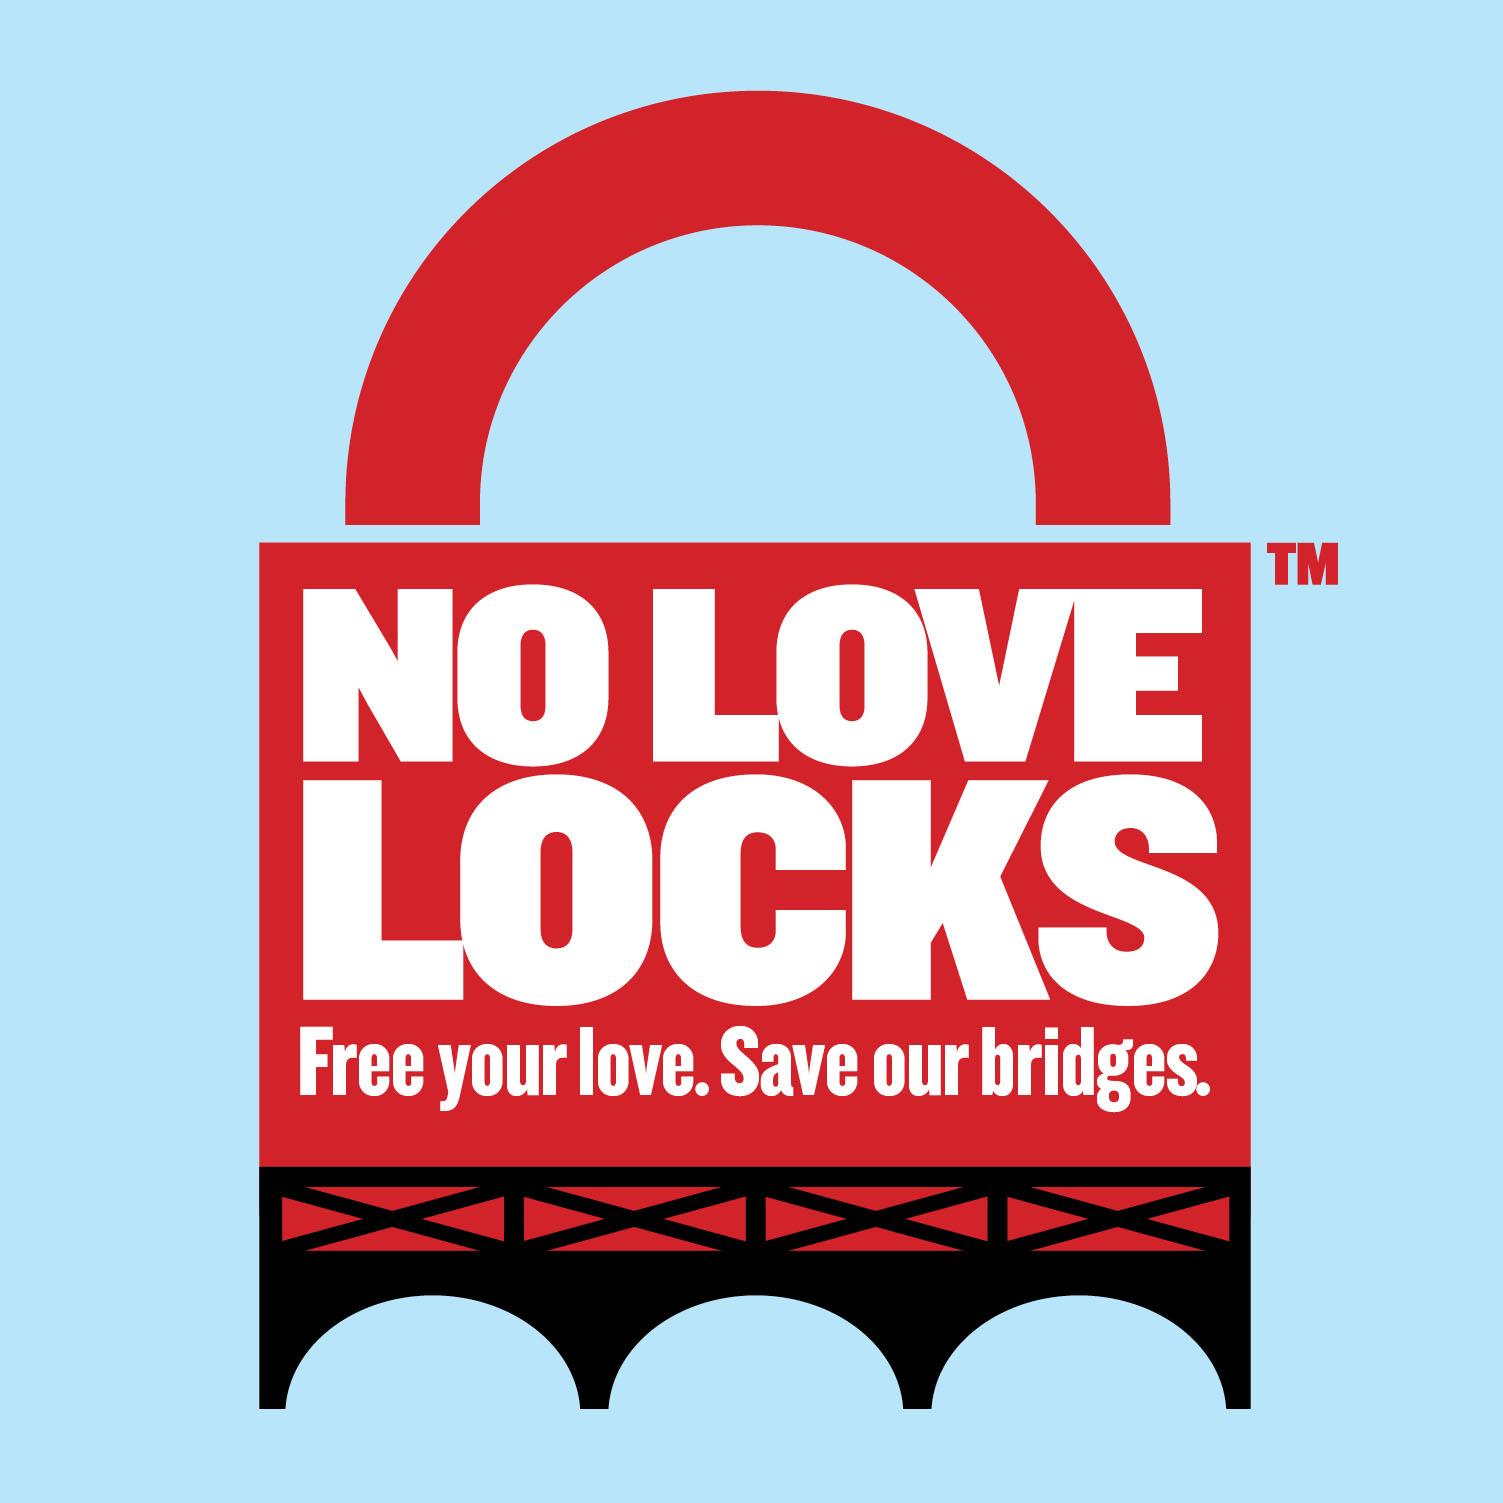 about no love locks